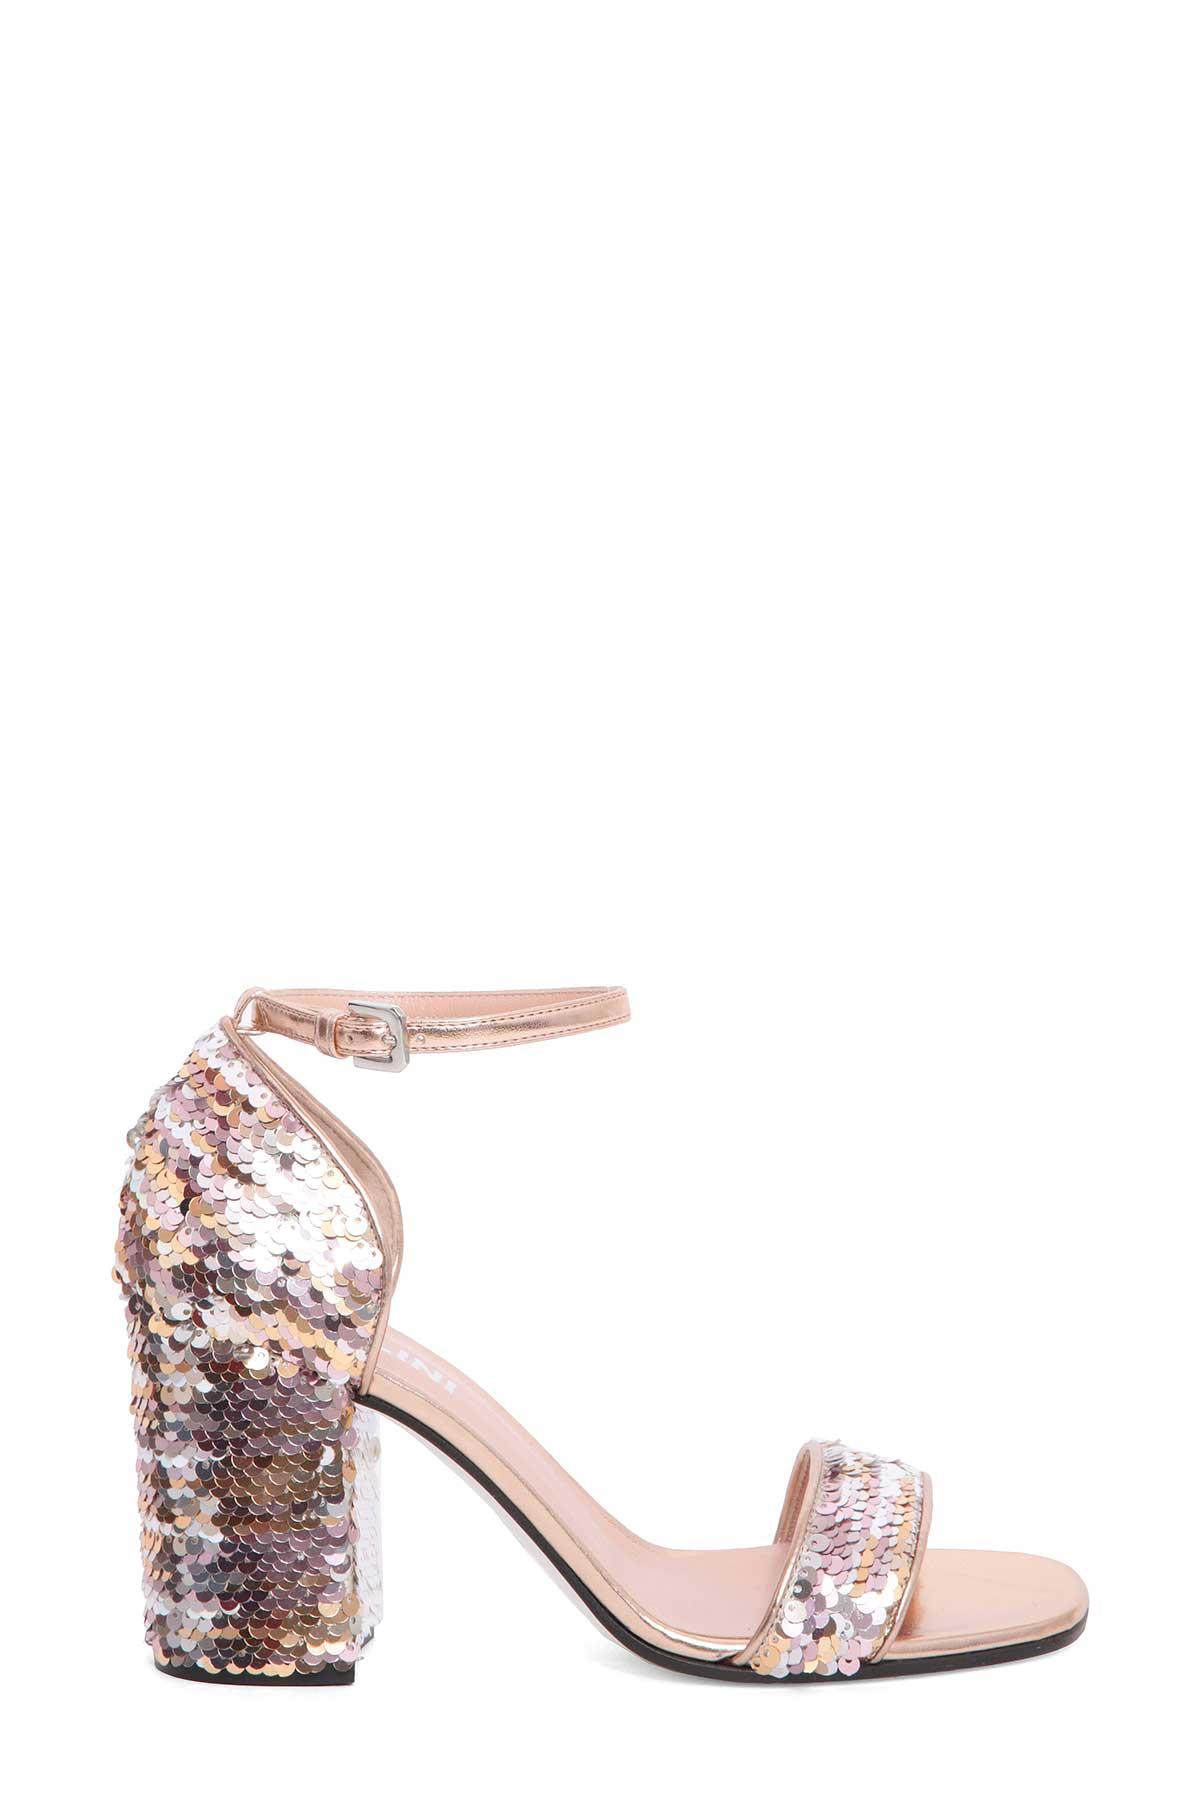 Pollini Sequined sandals A8Q8NDSV